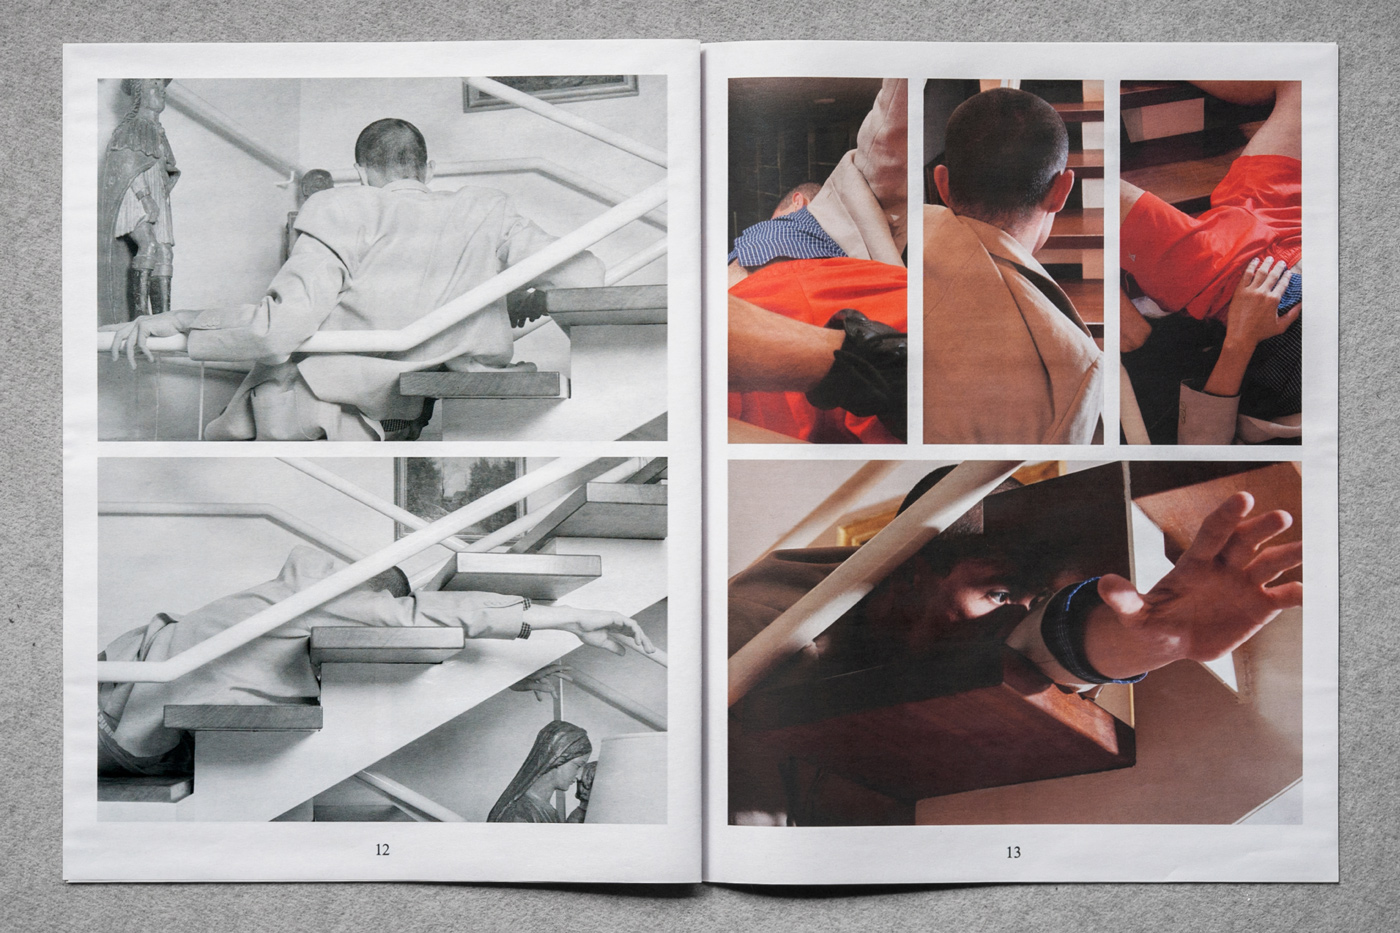 12 collide24 Europium - Europium's collaborative practice explores the relationship between photography and graphic design